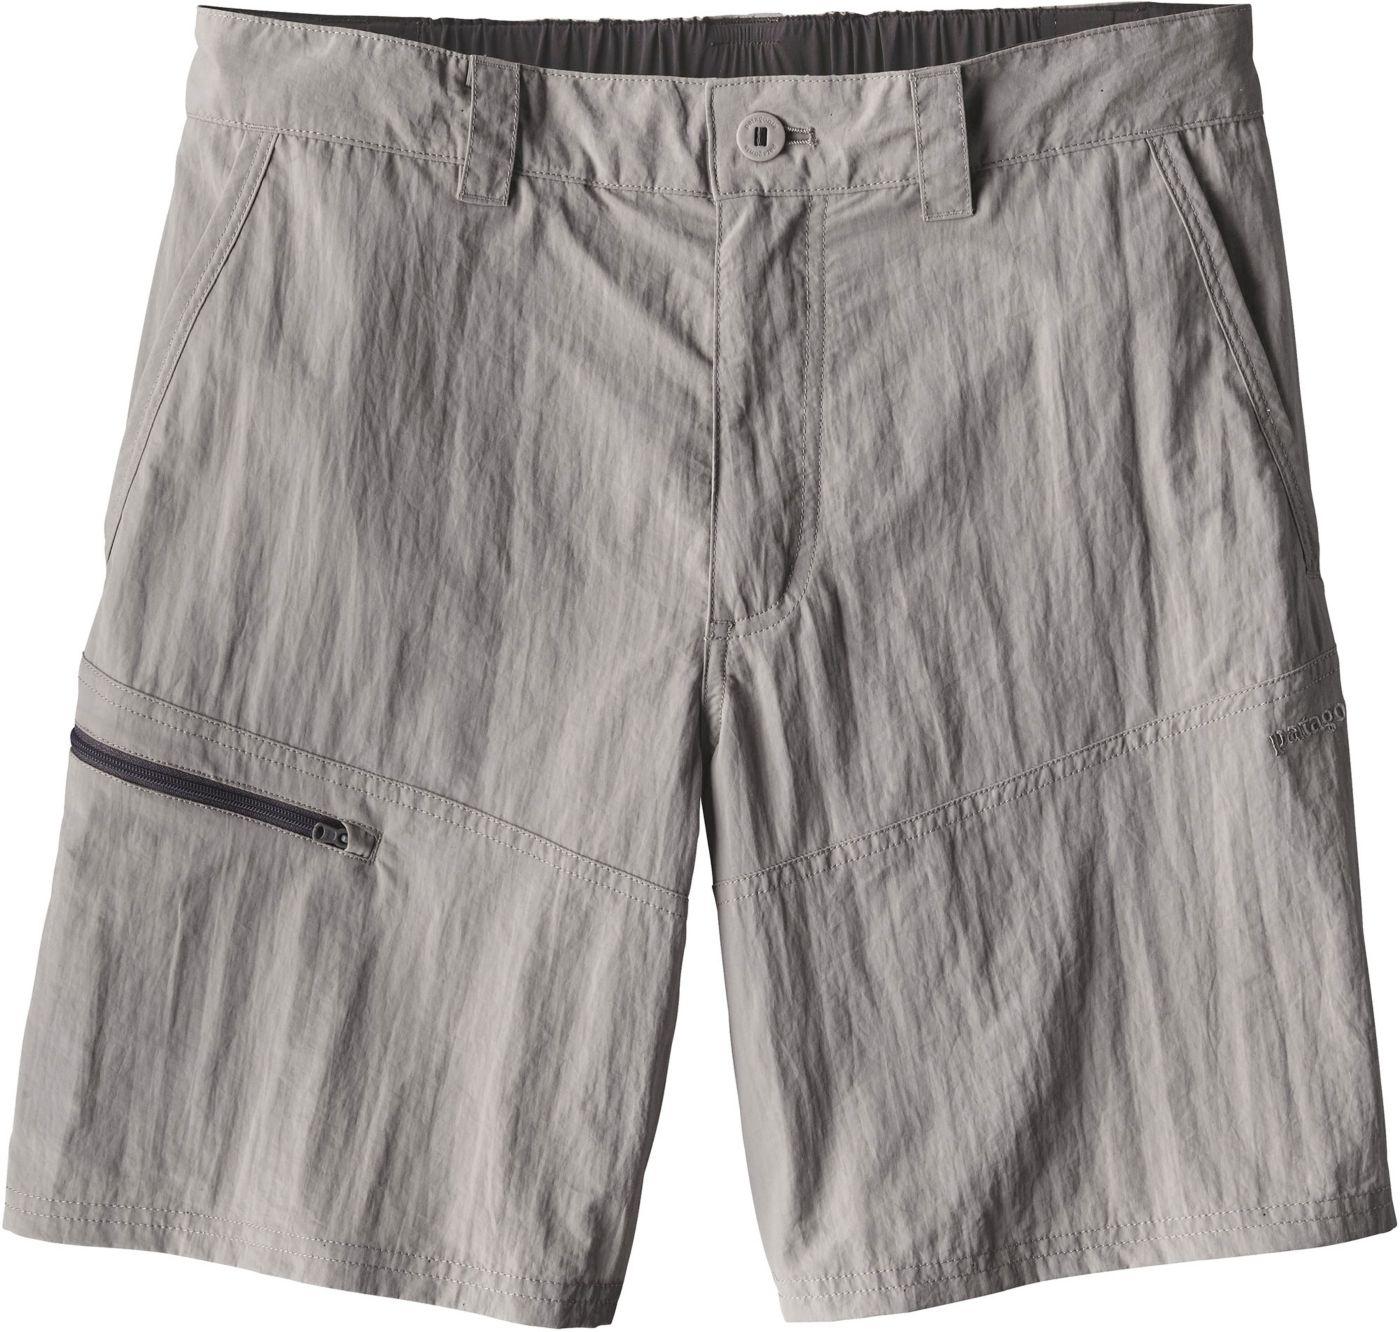 Patagonia Men's Sandy Cay Shorts